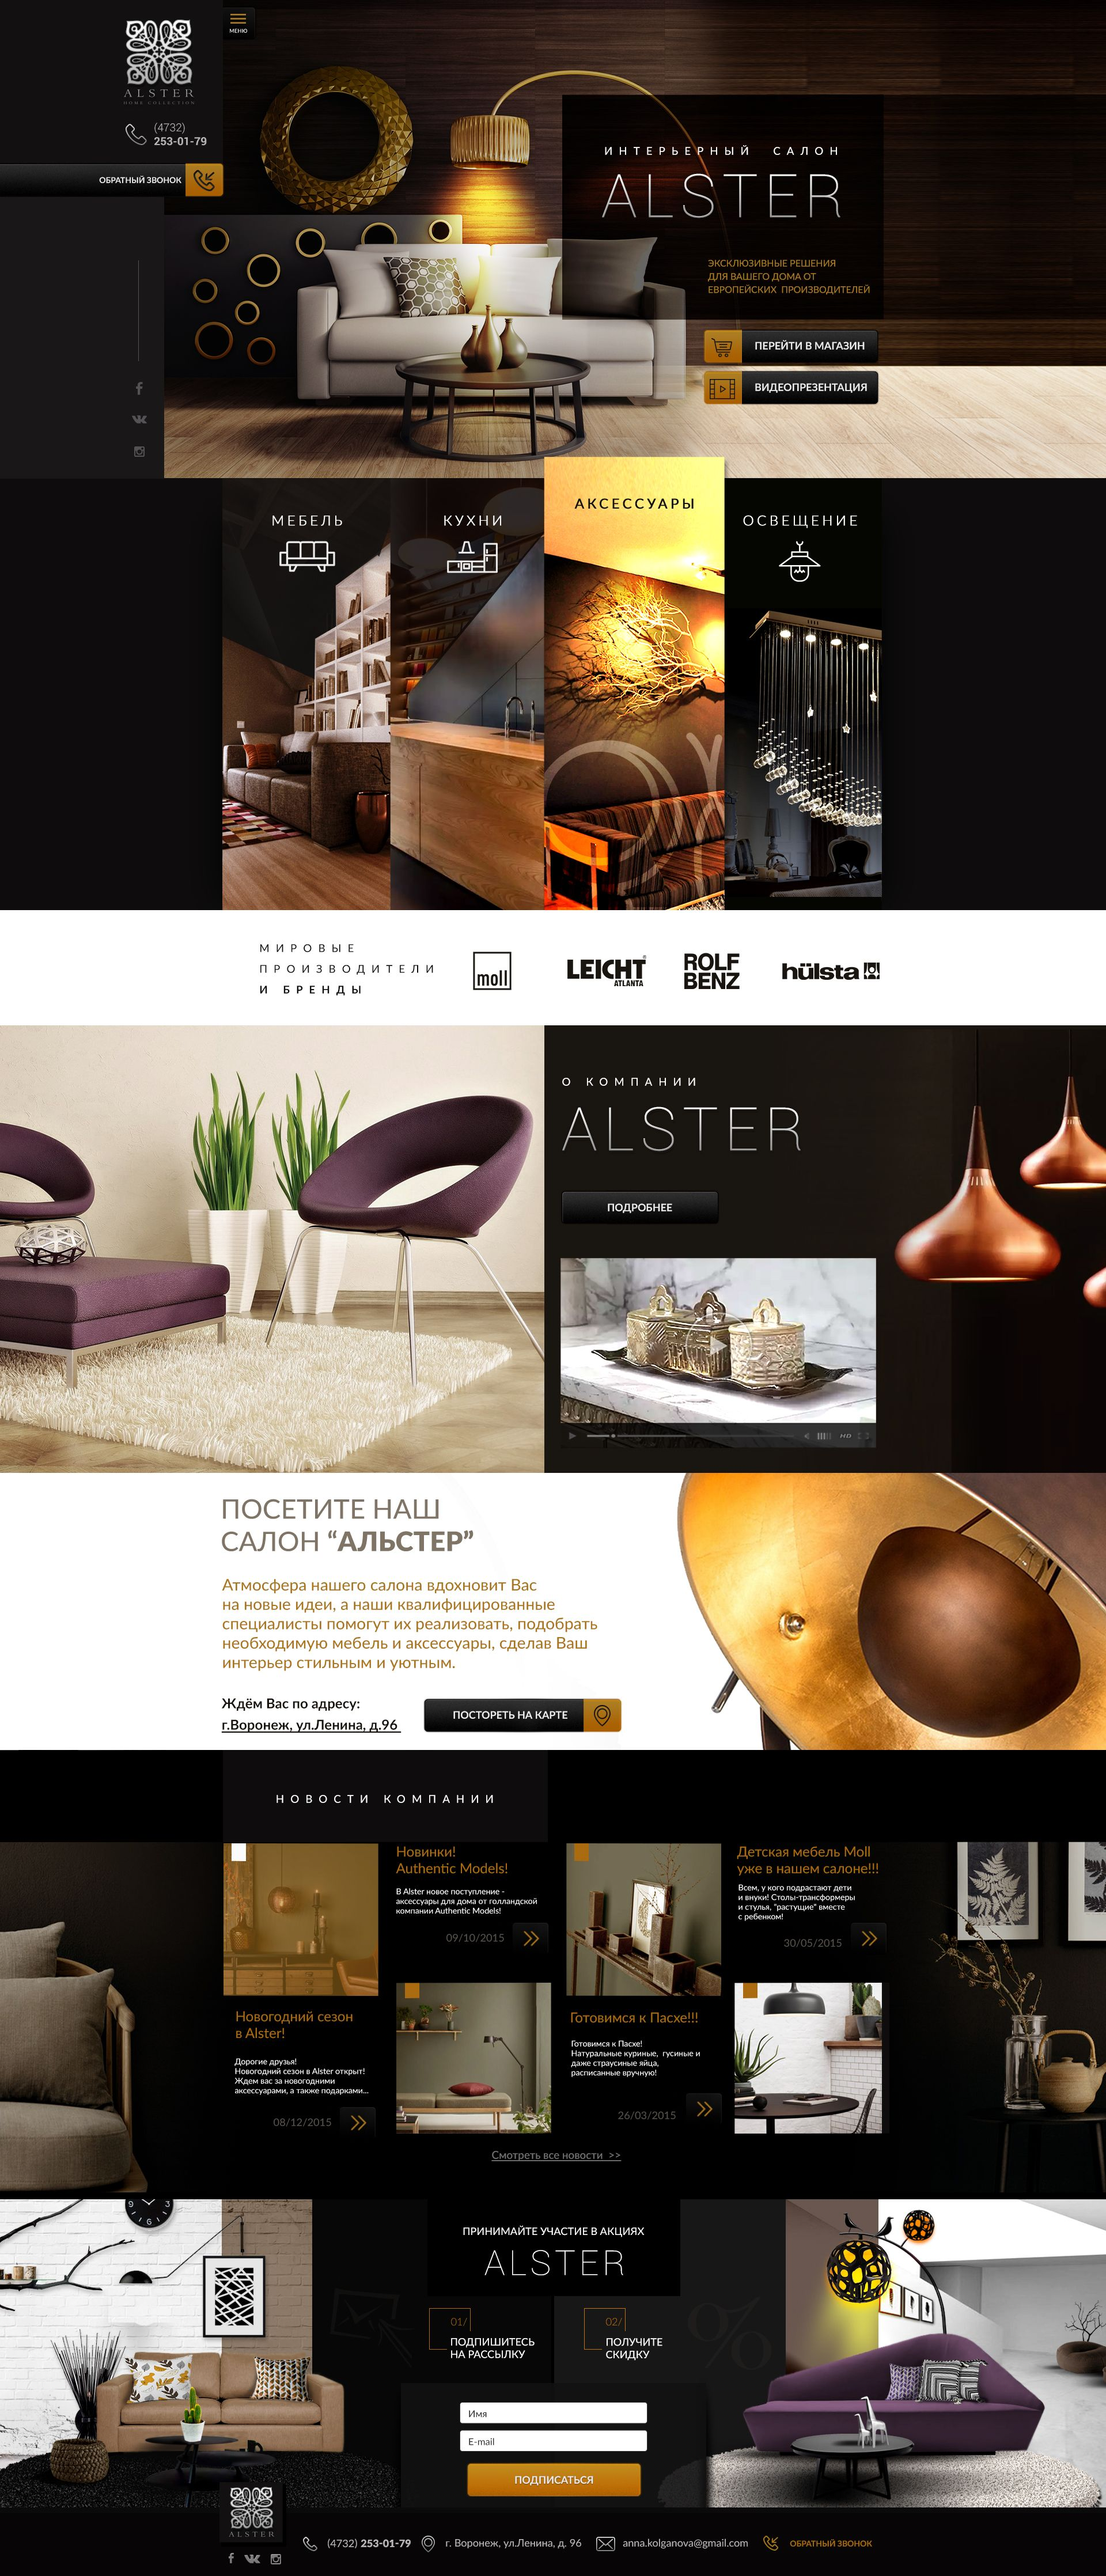 alster interior design landing page design uiux - Interior Design Web Pages